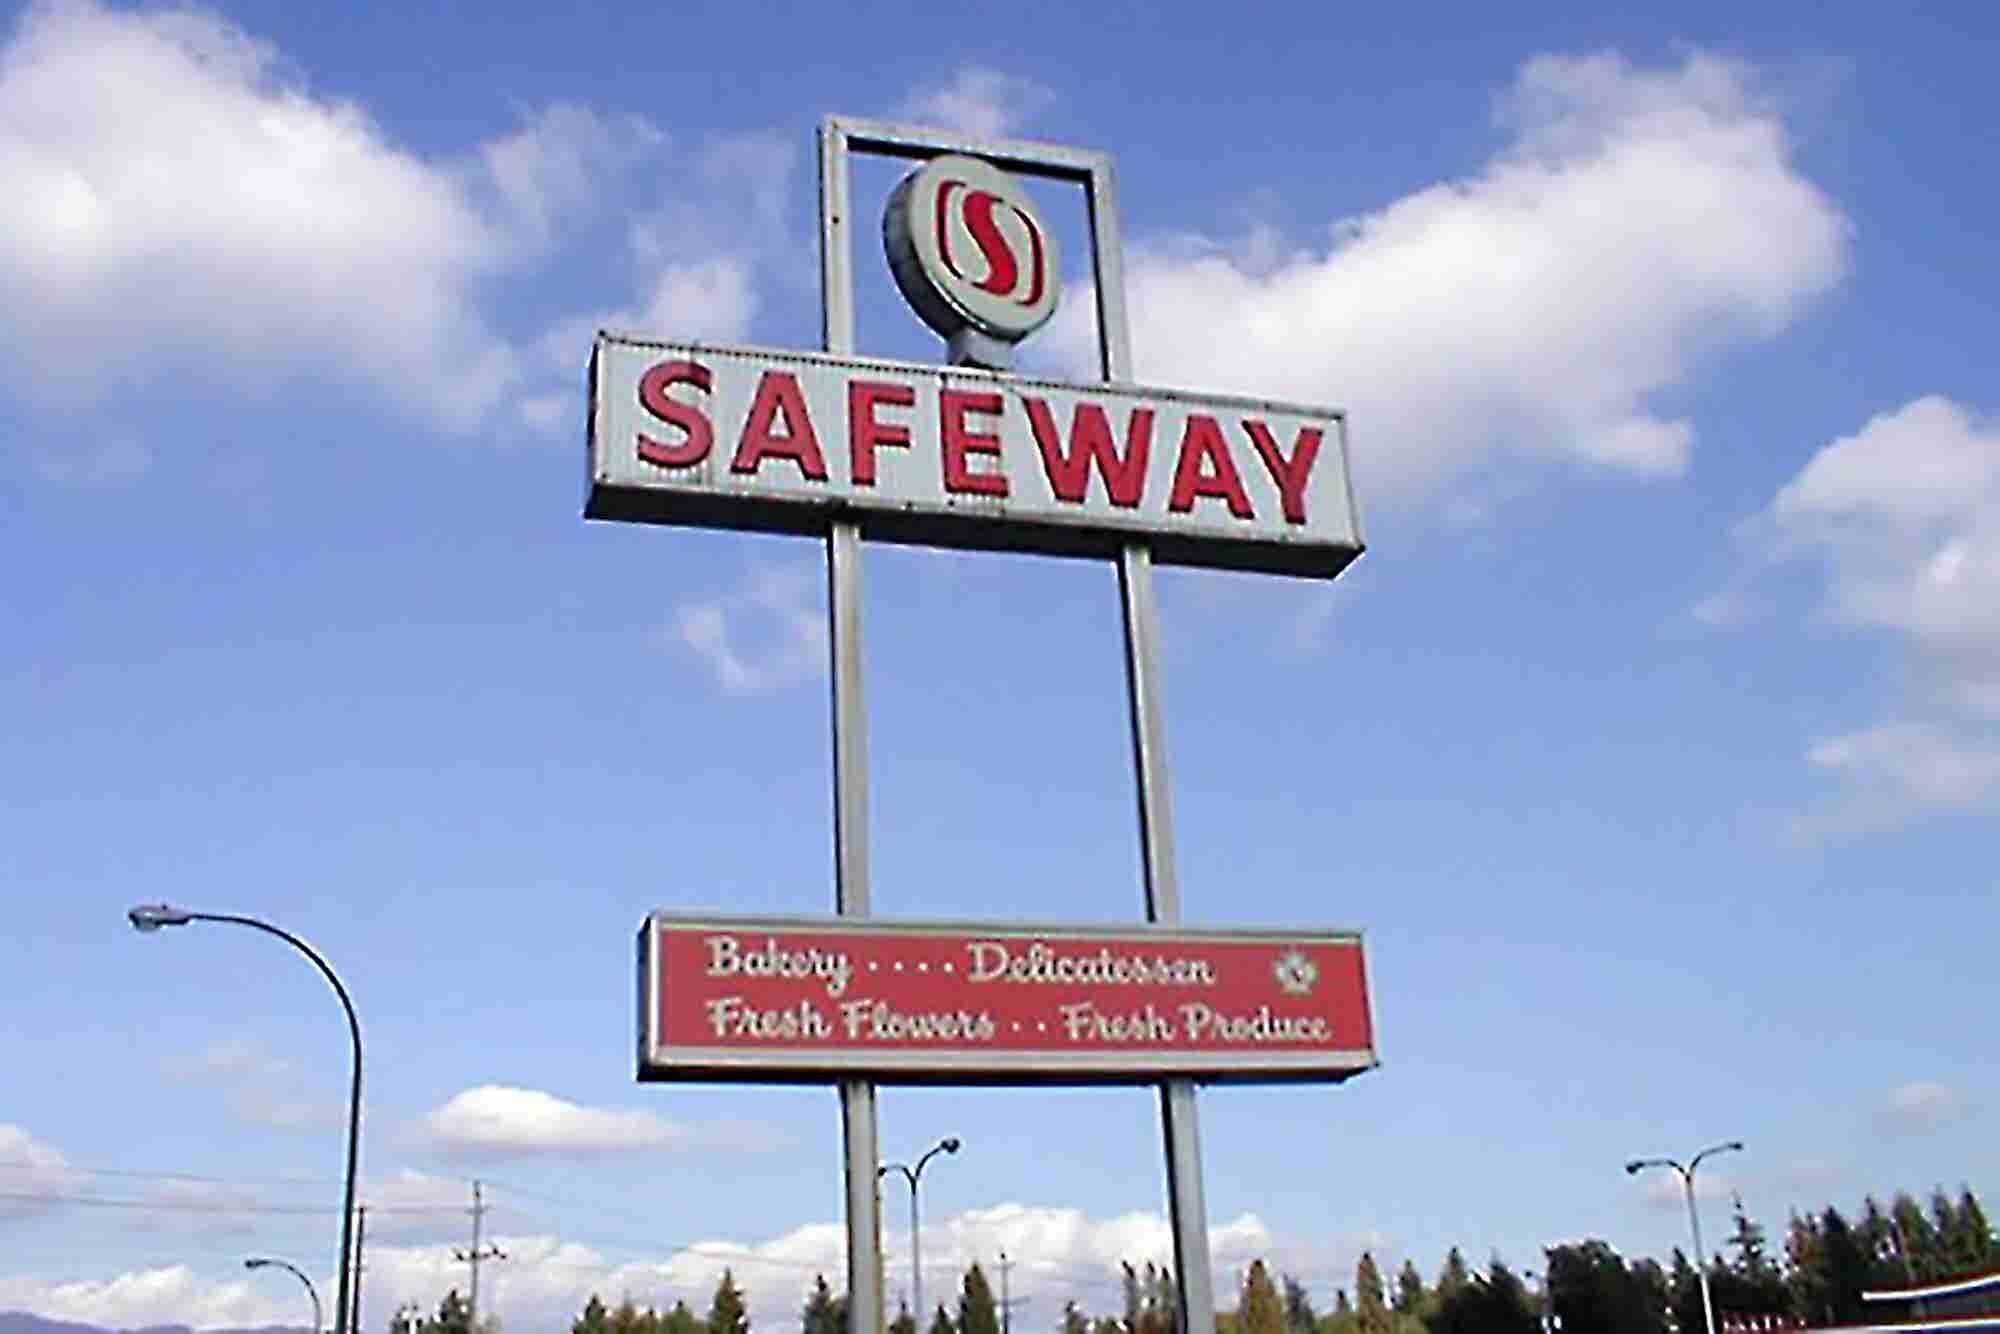 Safeway Seeks to Dissolve Secret $350 Million Deal With Beleaguered Blood Startup Theranos